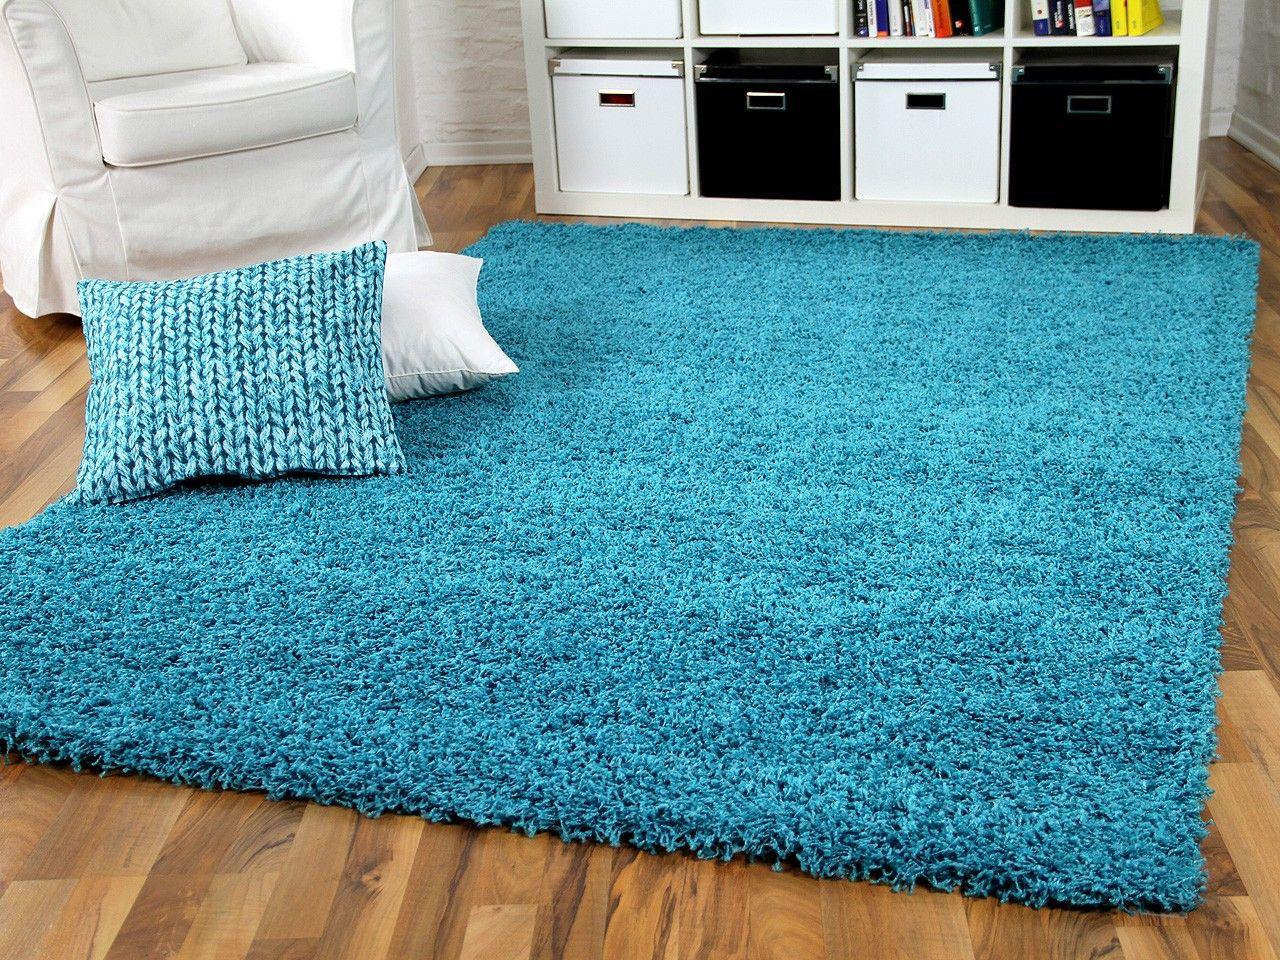 Hochflor langflor shaggy teppich aloha türkis teppiche hochflor